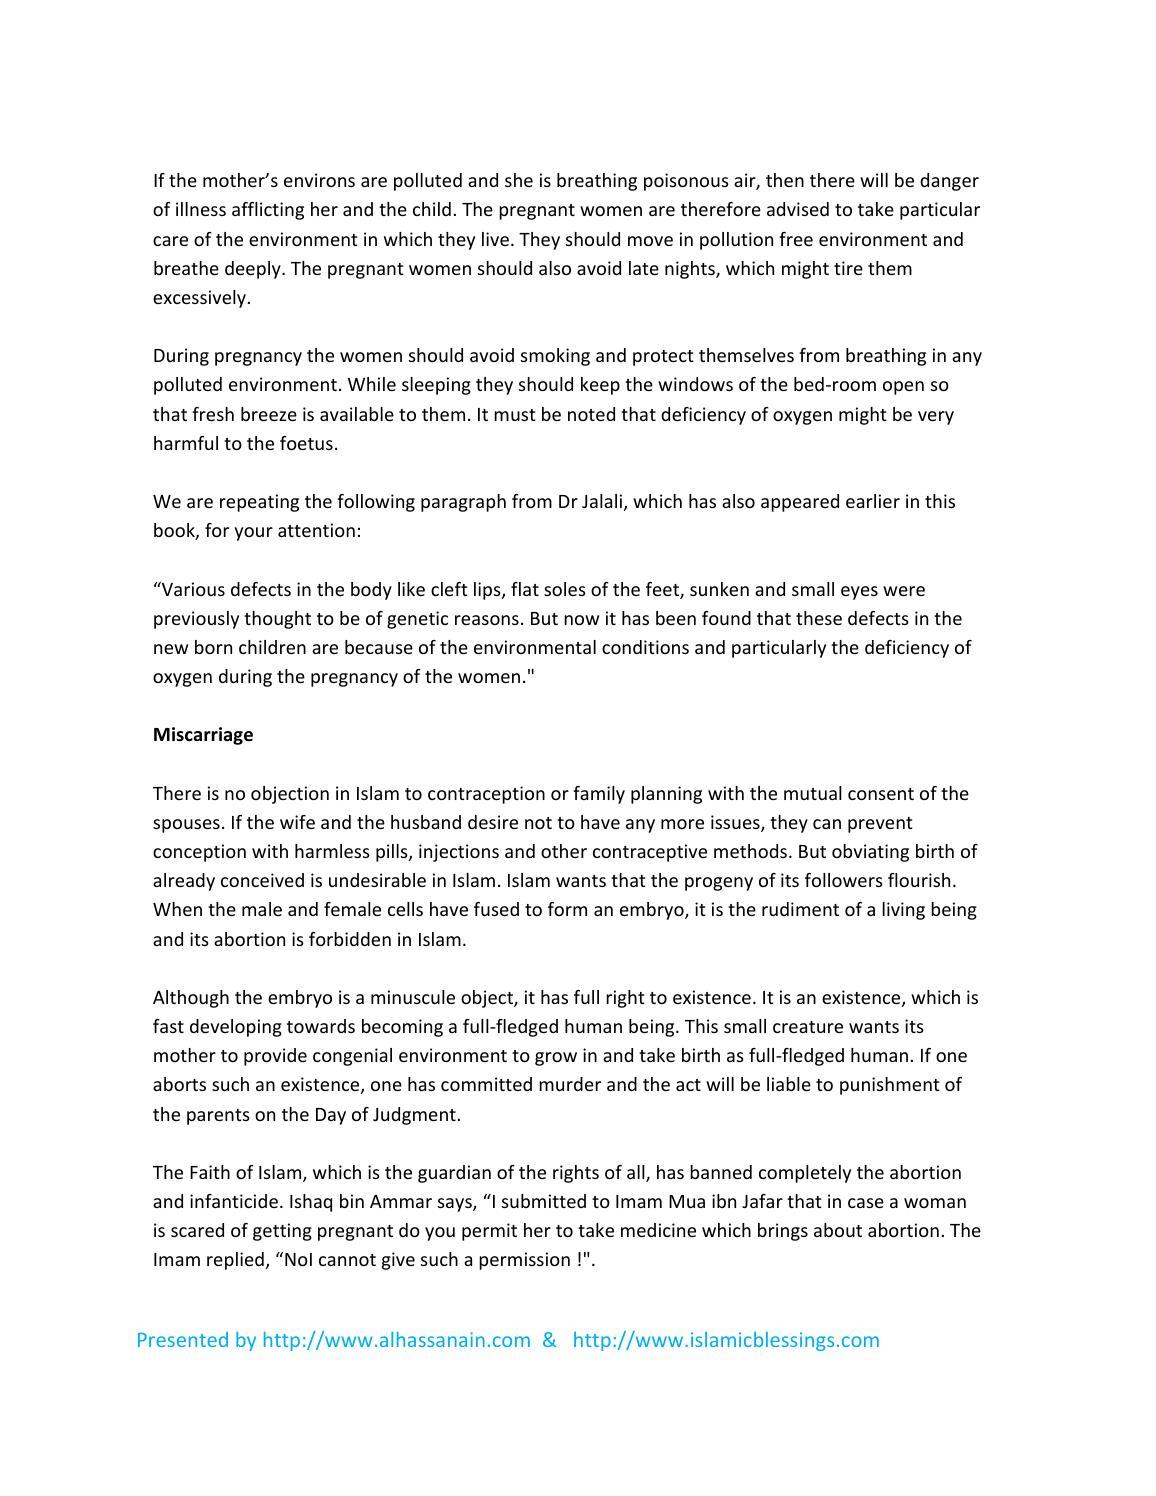 Principles of upbringing children by SYED MUHAMMAD JAWED - issuu